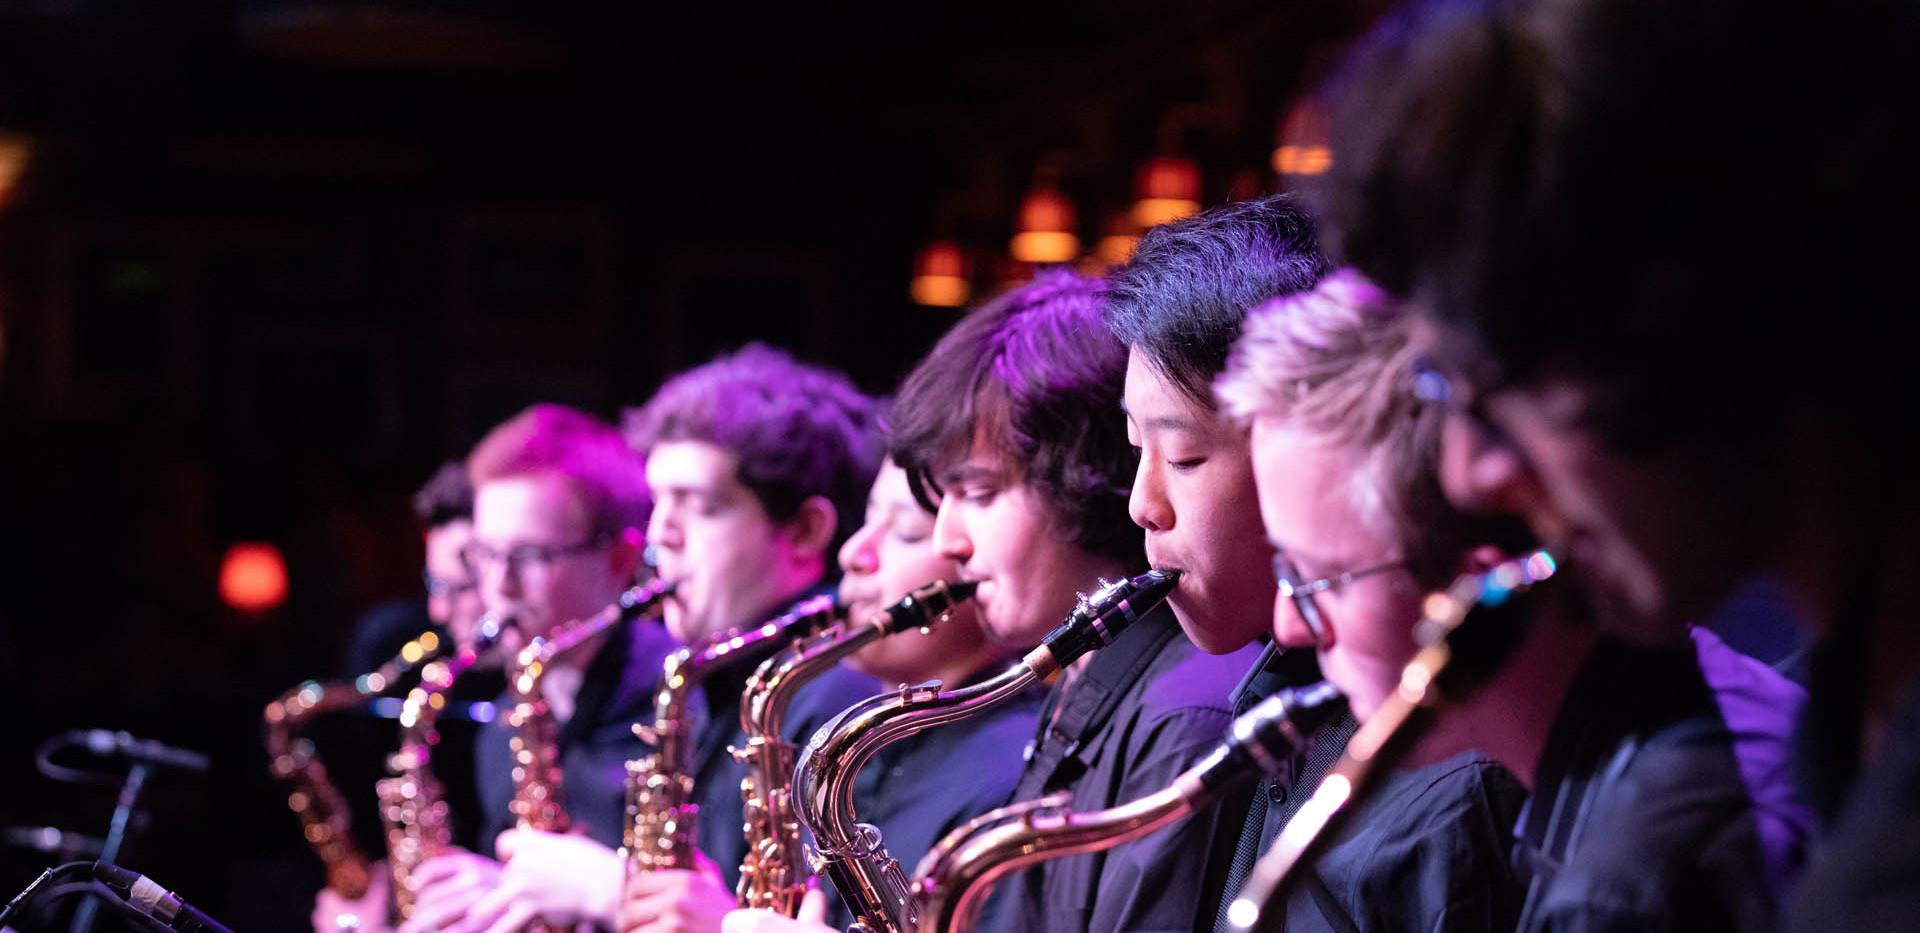 Eltham College: Ronnie Scotts Concert